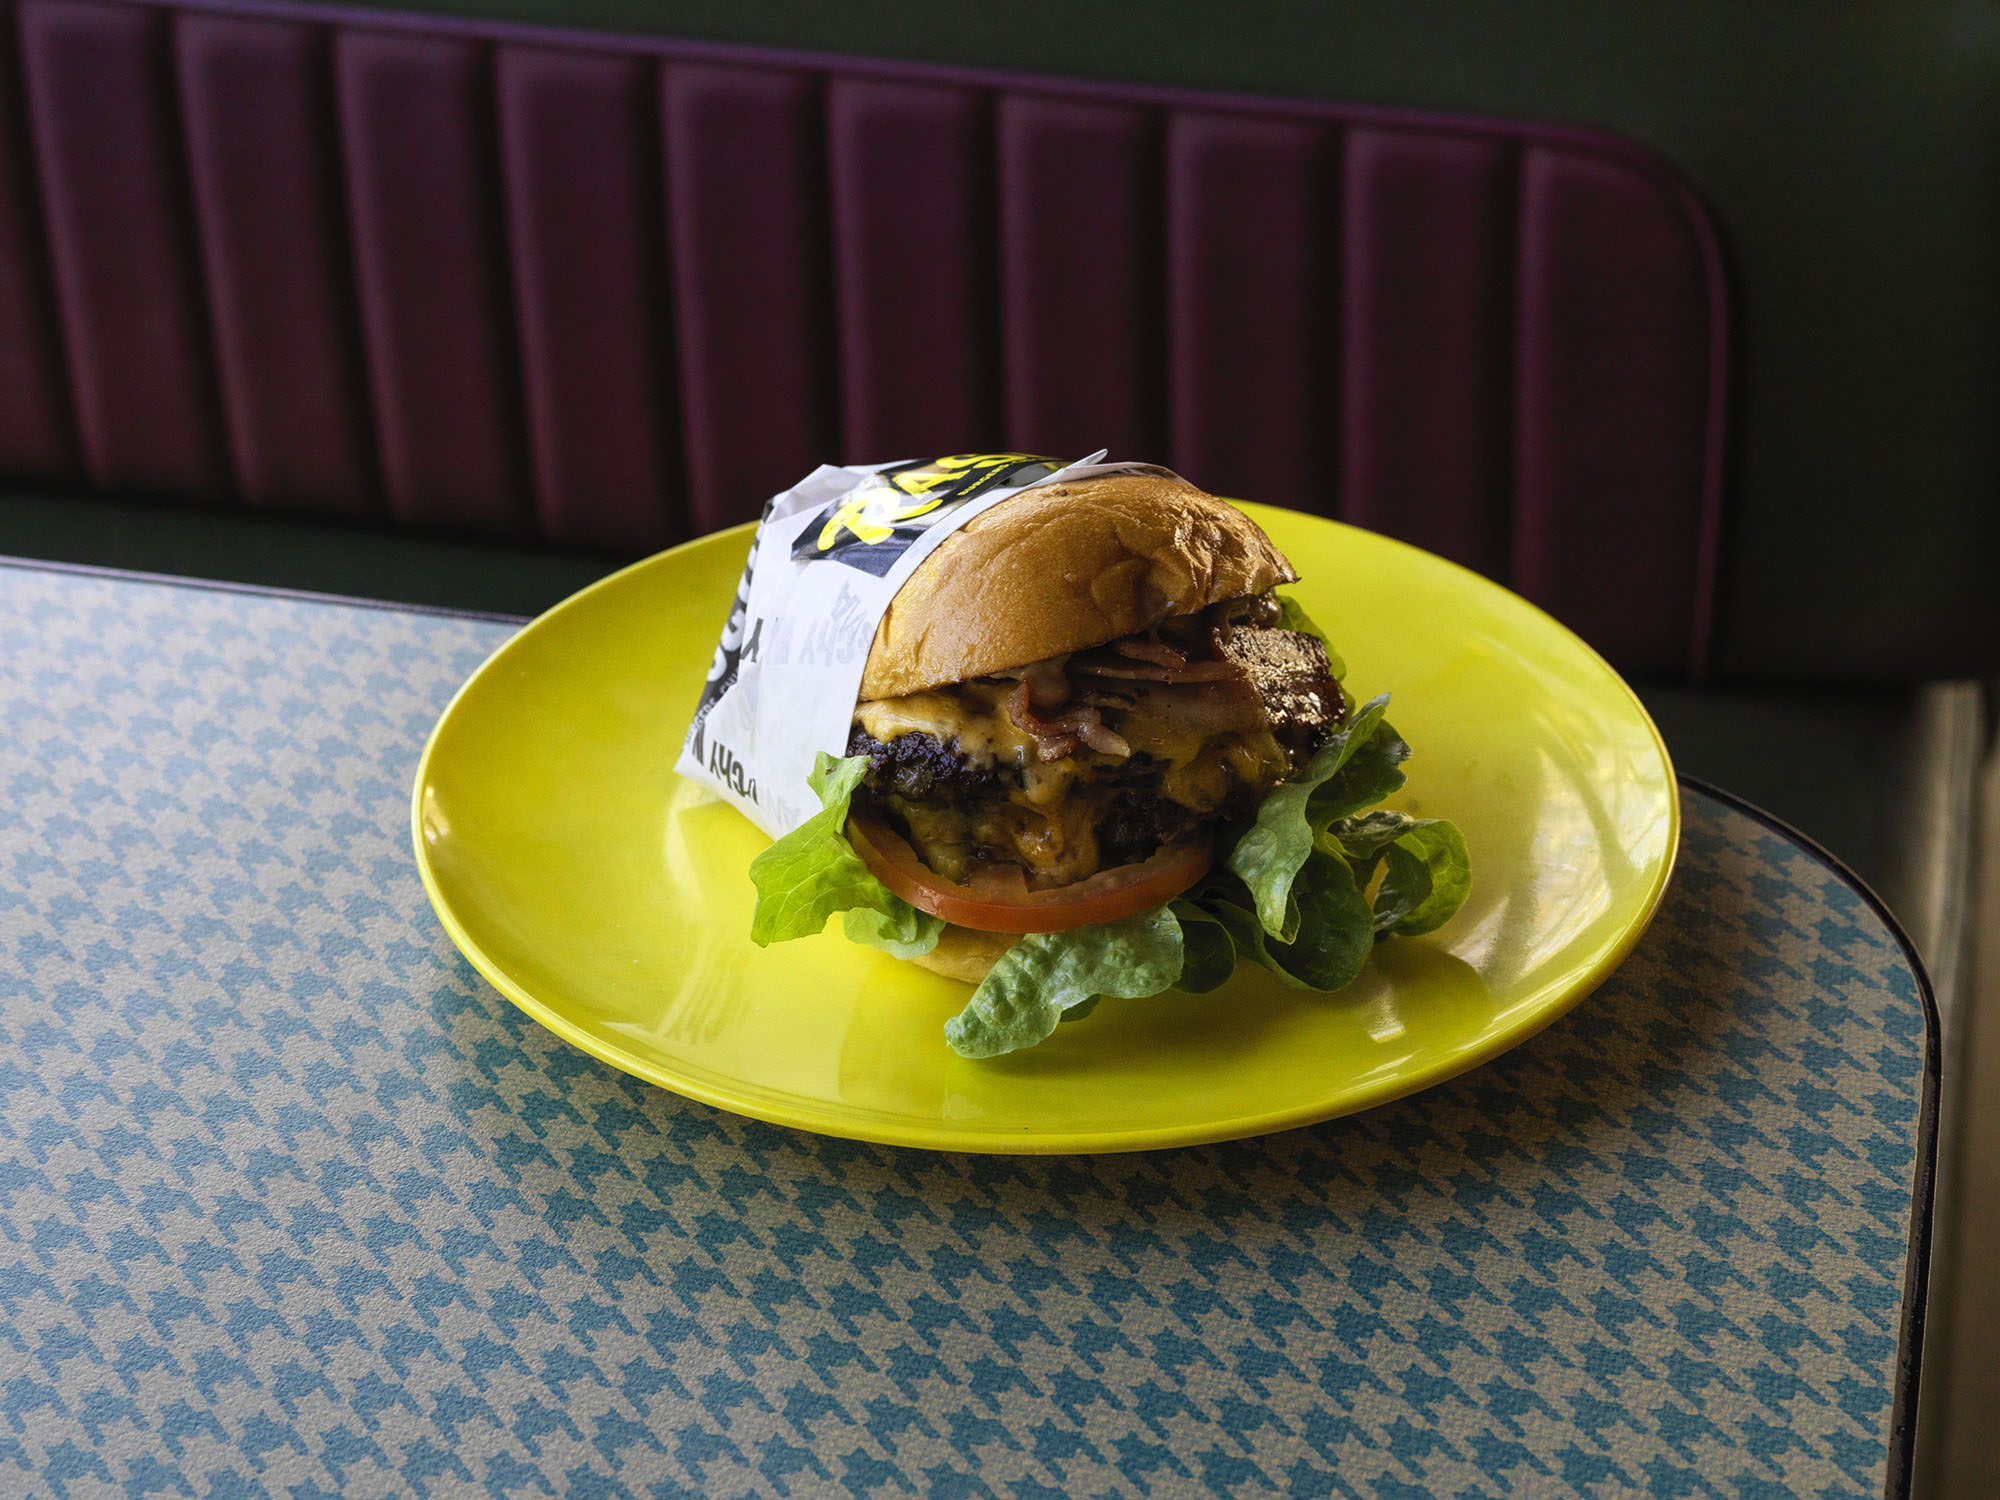 The Rascal Burger - enough said.